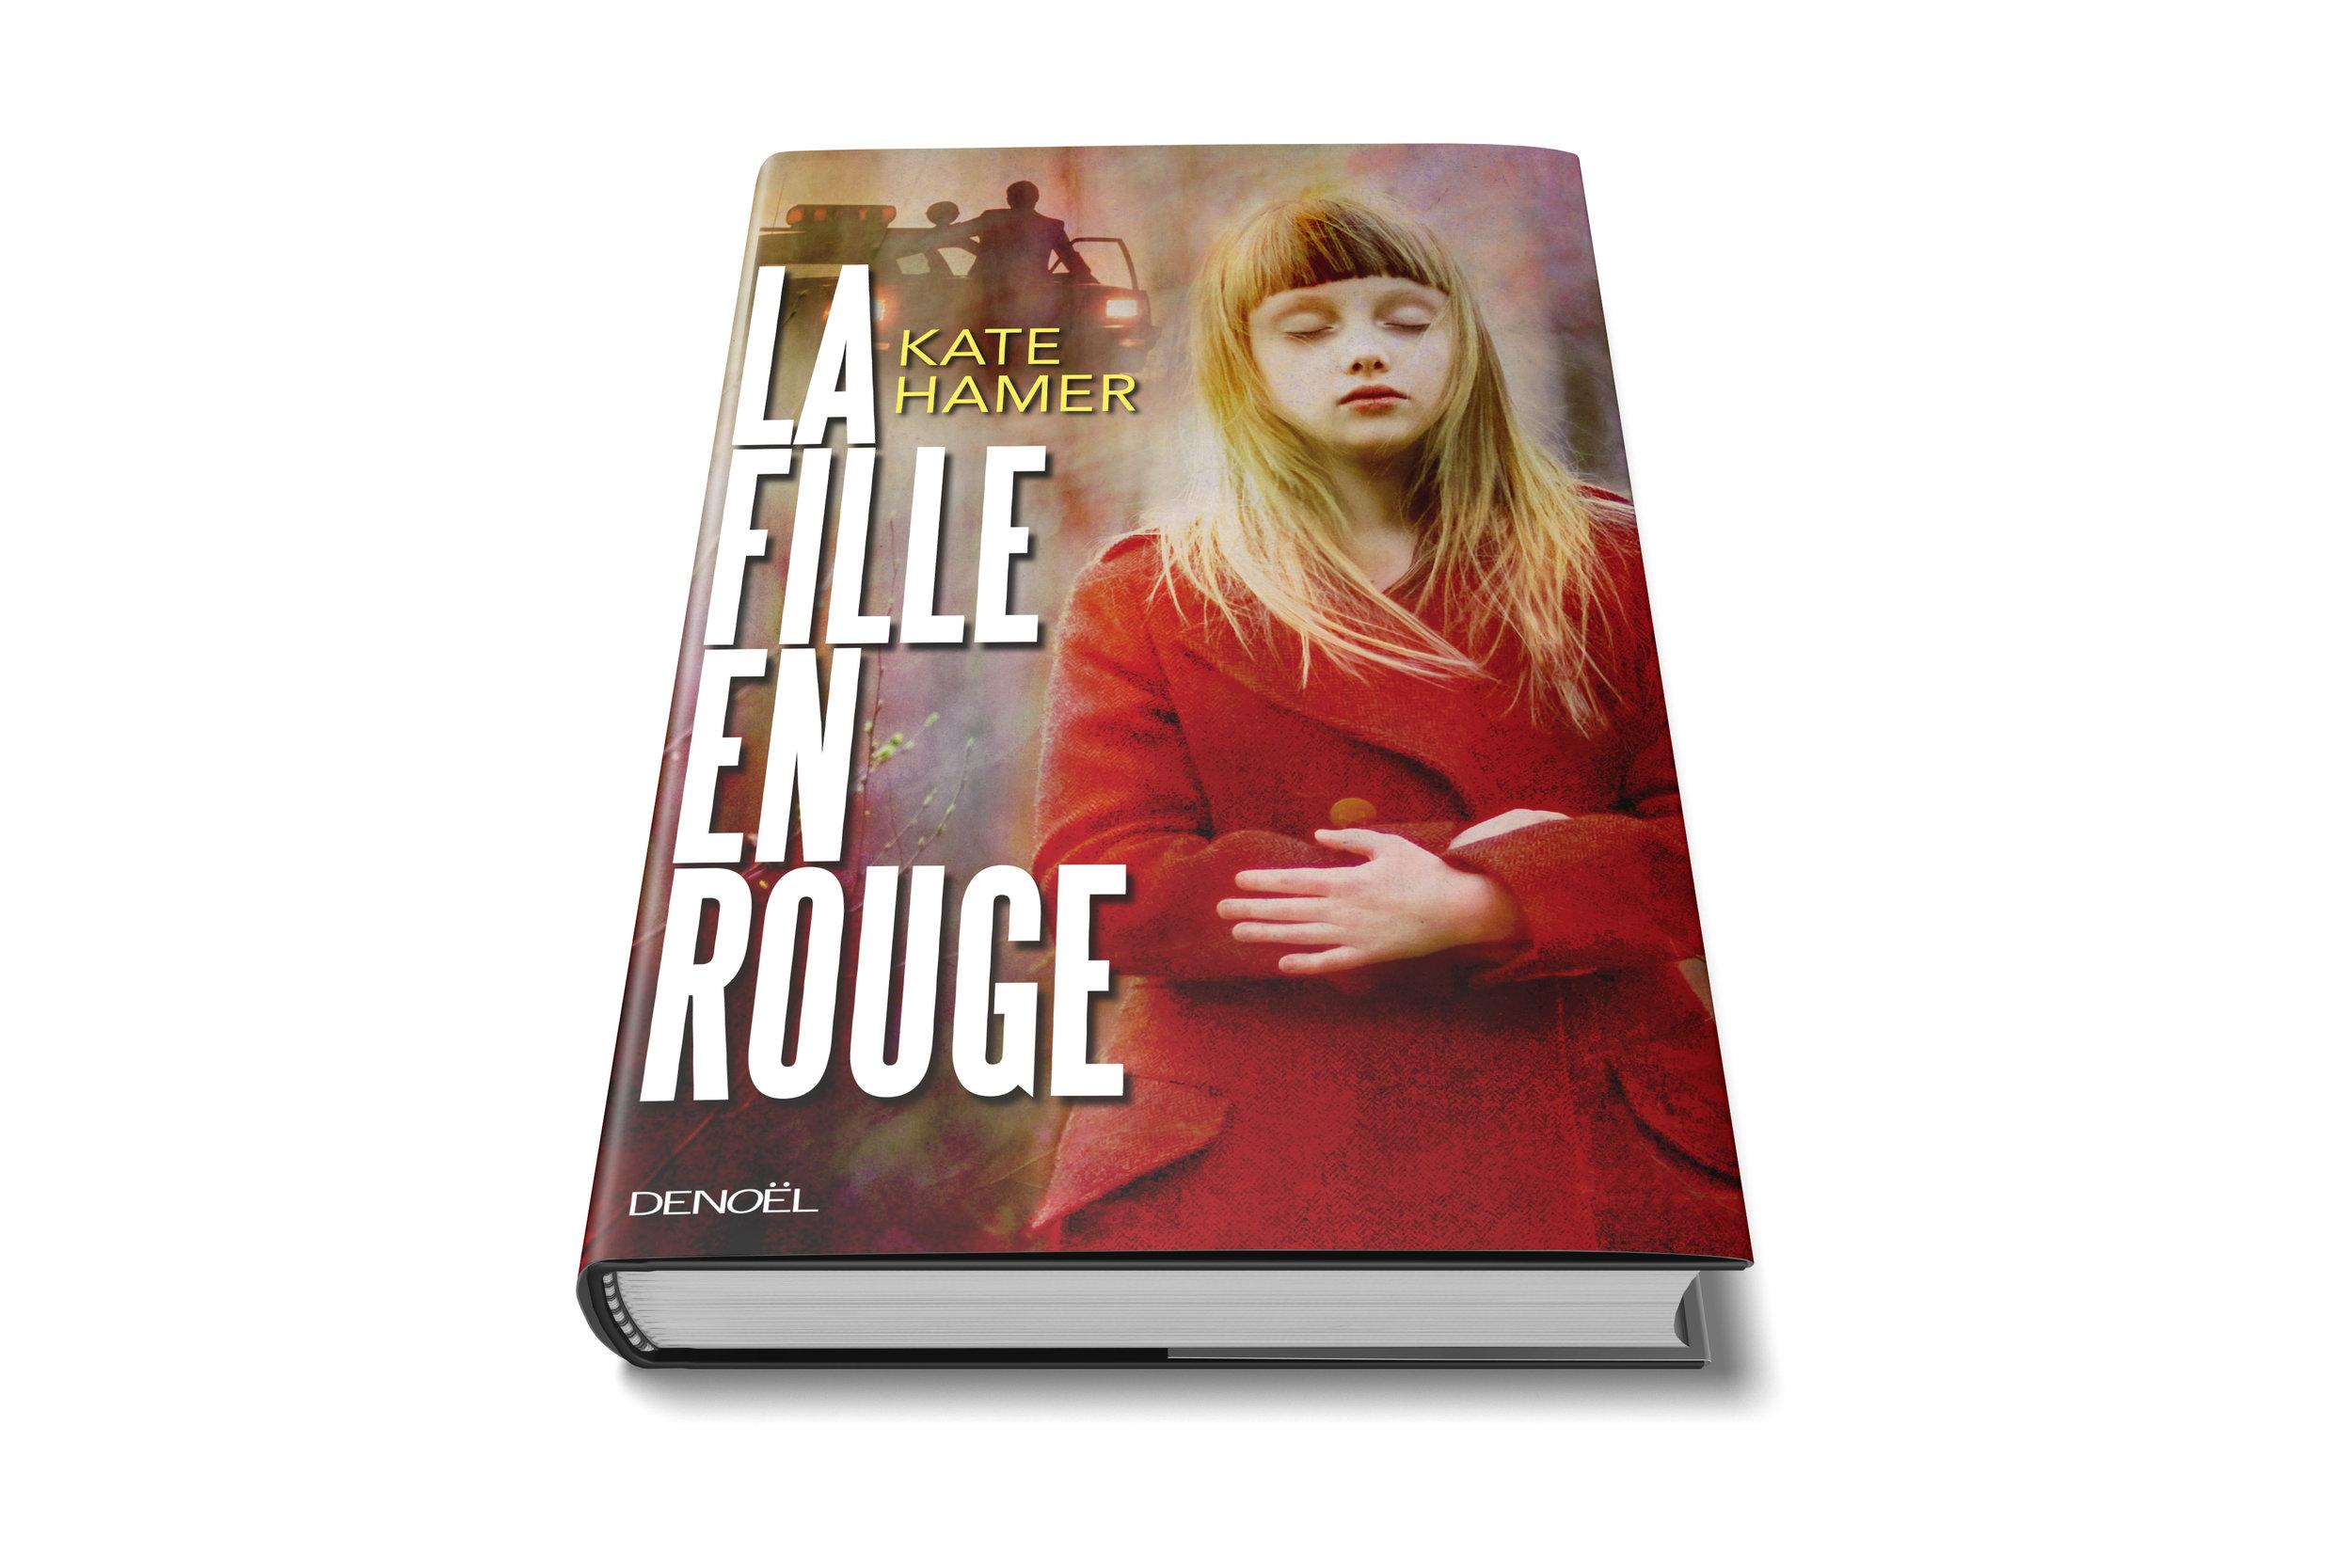 Book cover. Fiction/thriller  Original composite artwork from stock photography. Artwork : Nohemy Adrian